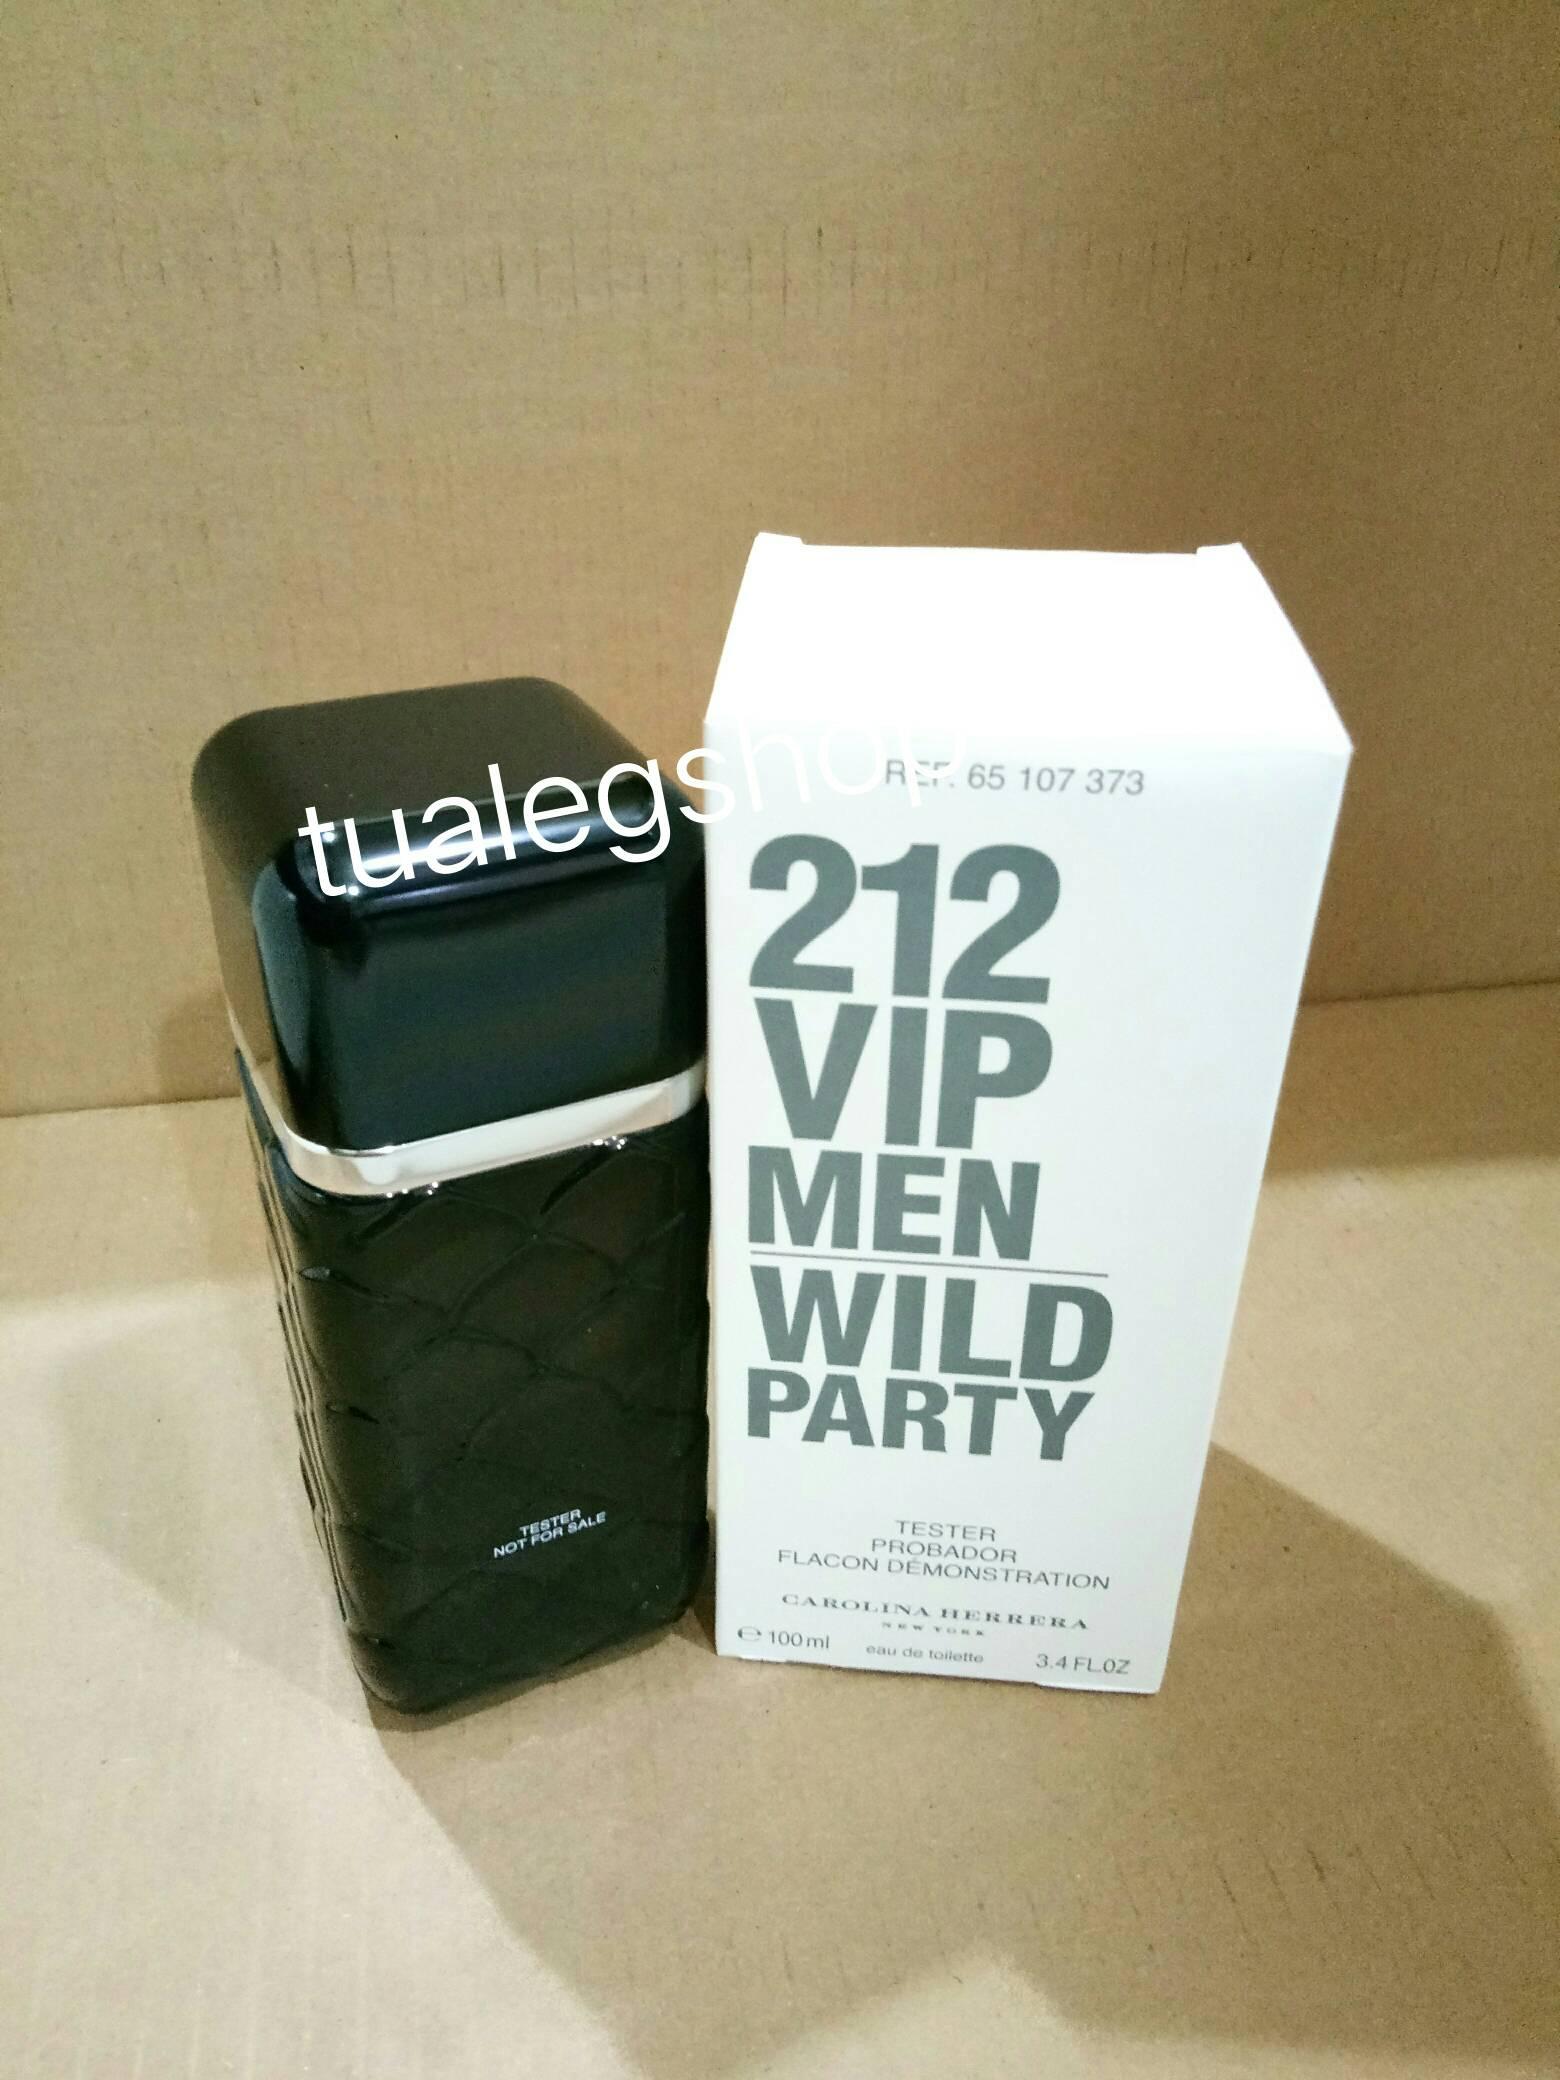 Carolina Herrera 212 VIP Men Wild Party EDT 100 ml.(tester box)